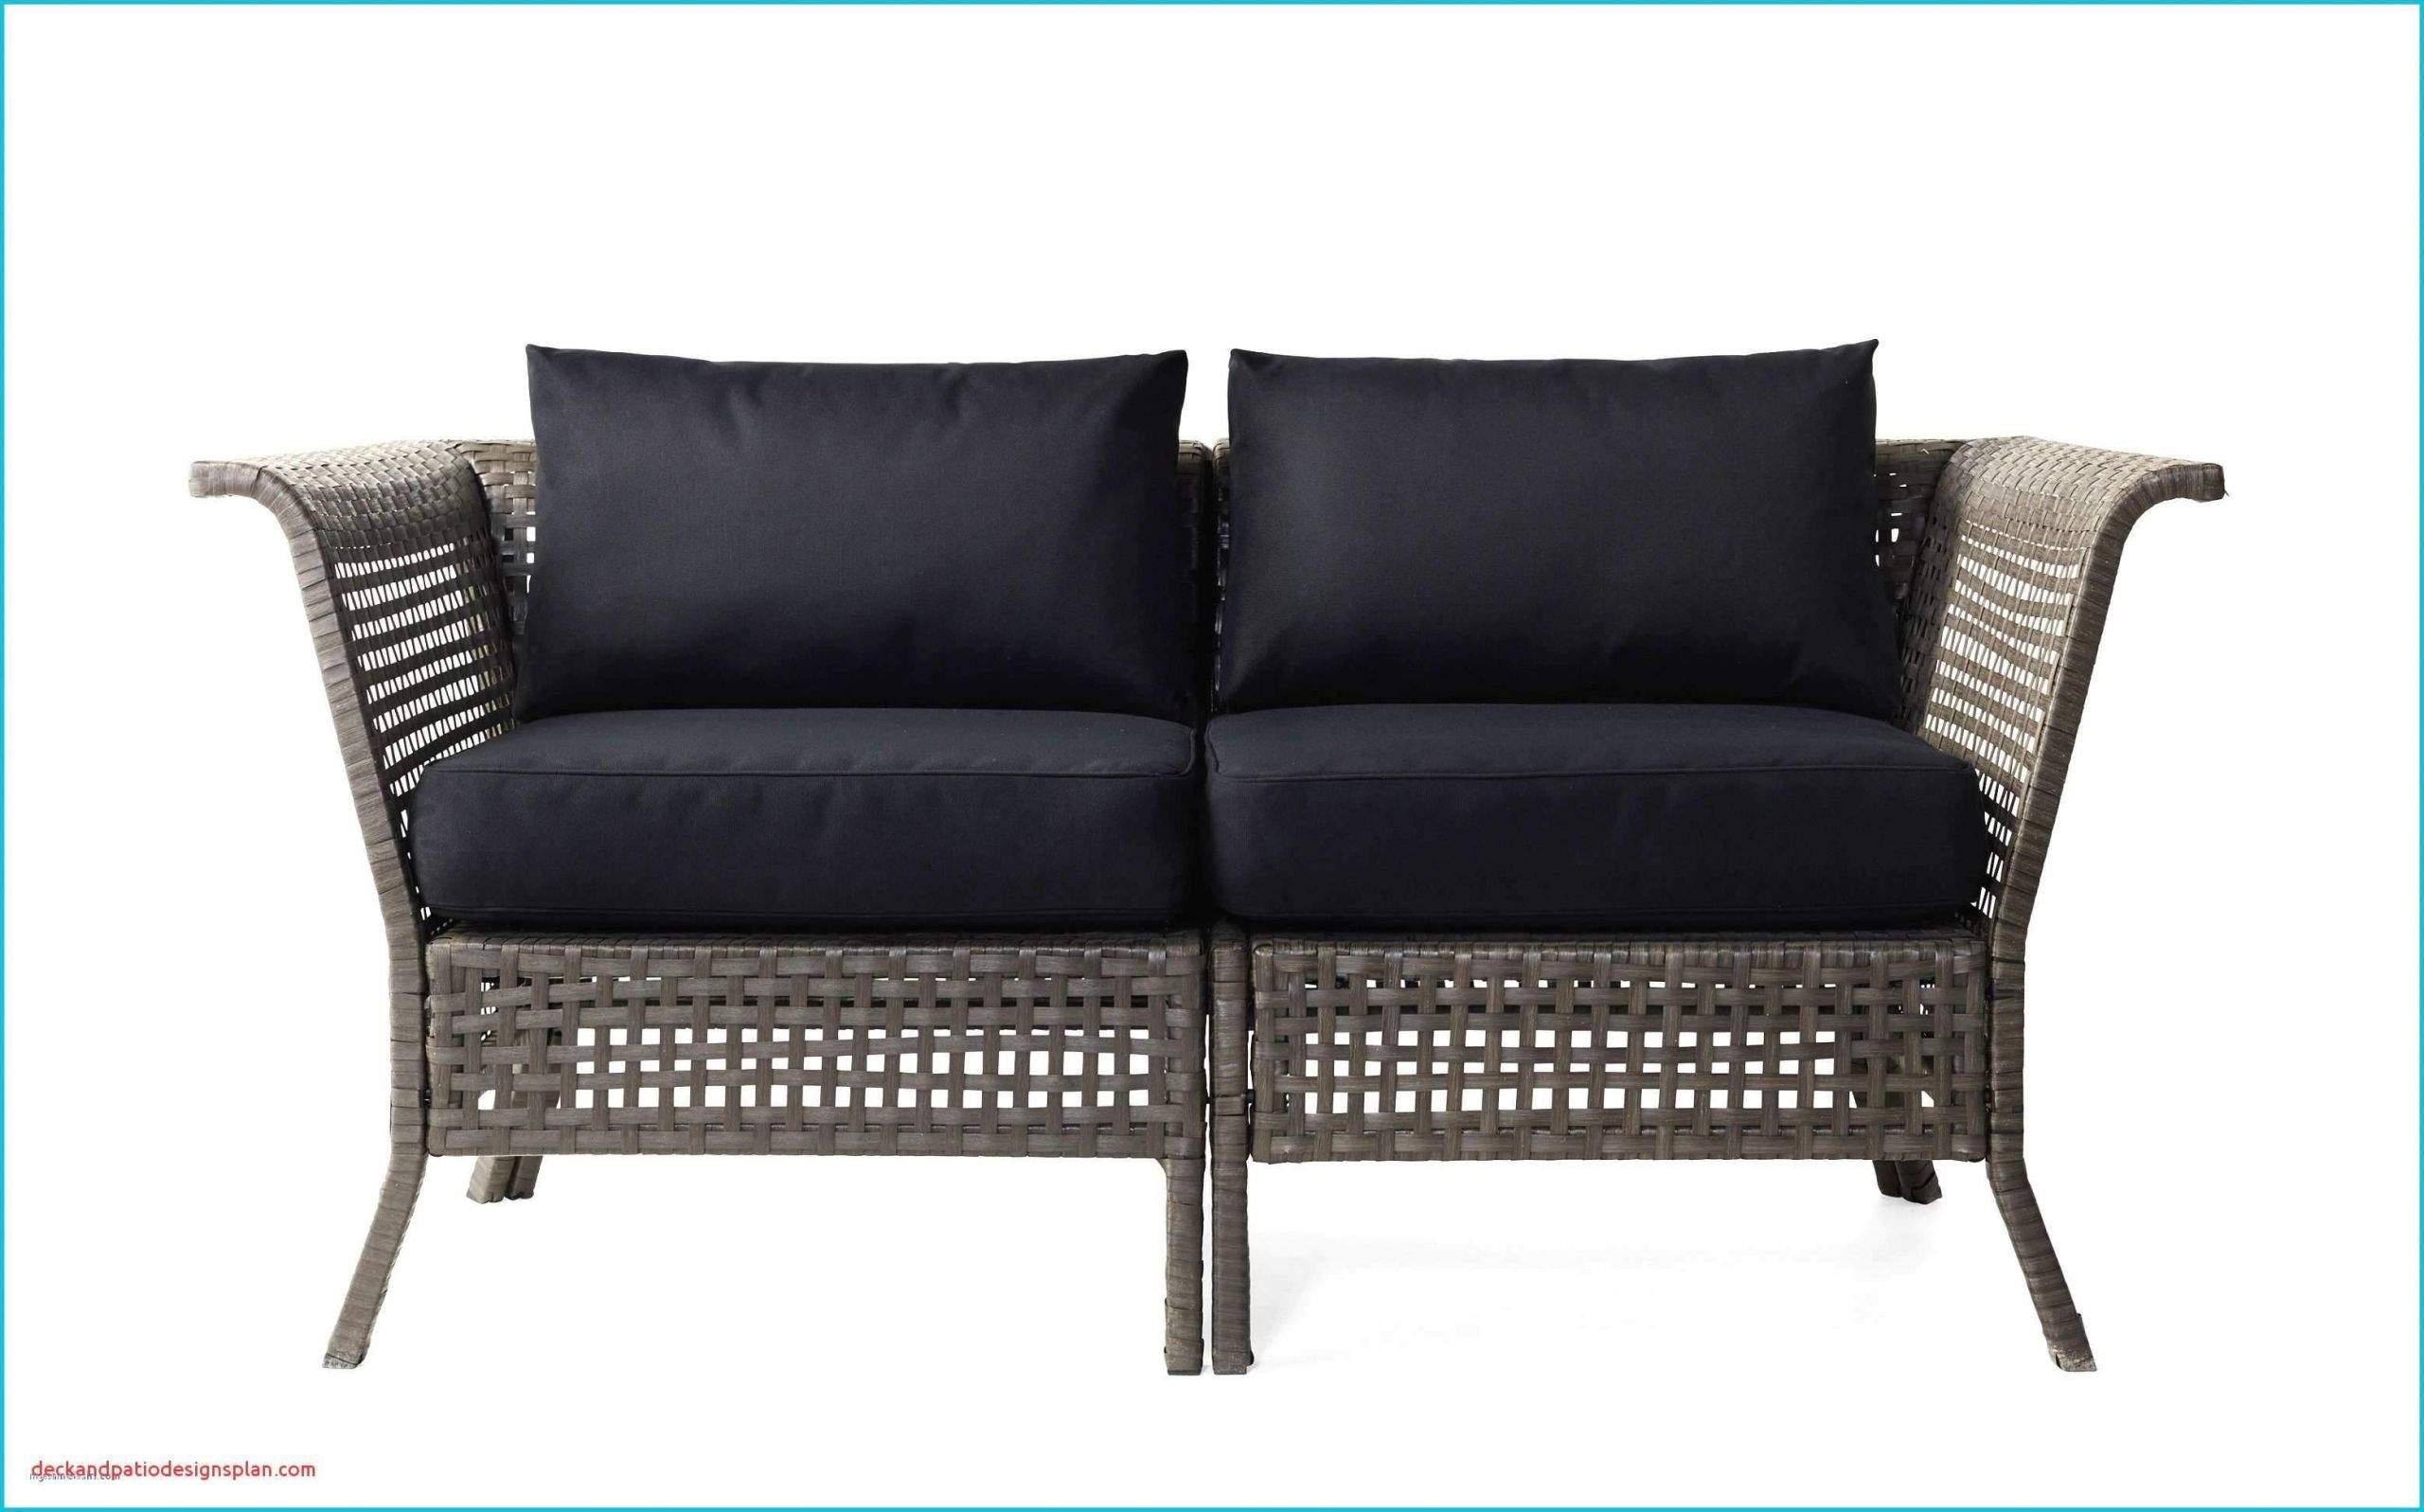 rattan sofa garten luxus sofa und sessel elegant rattan sessel rattan couch 0d of rattan sofa garten scaled